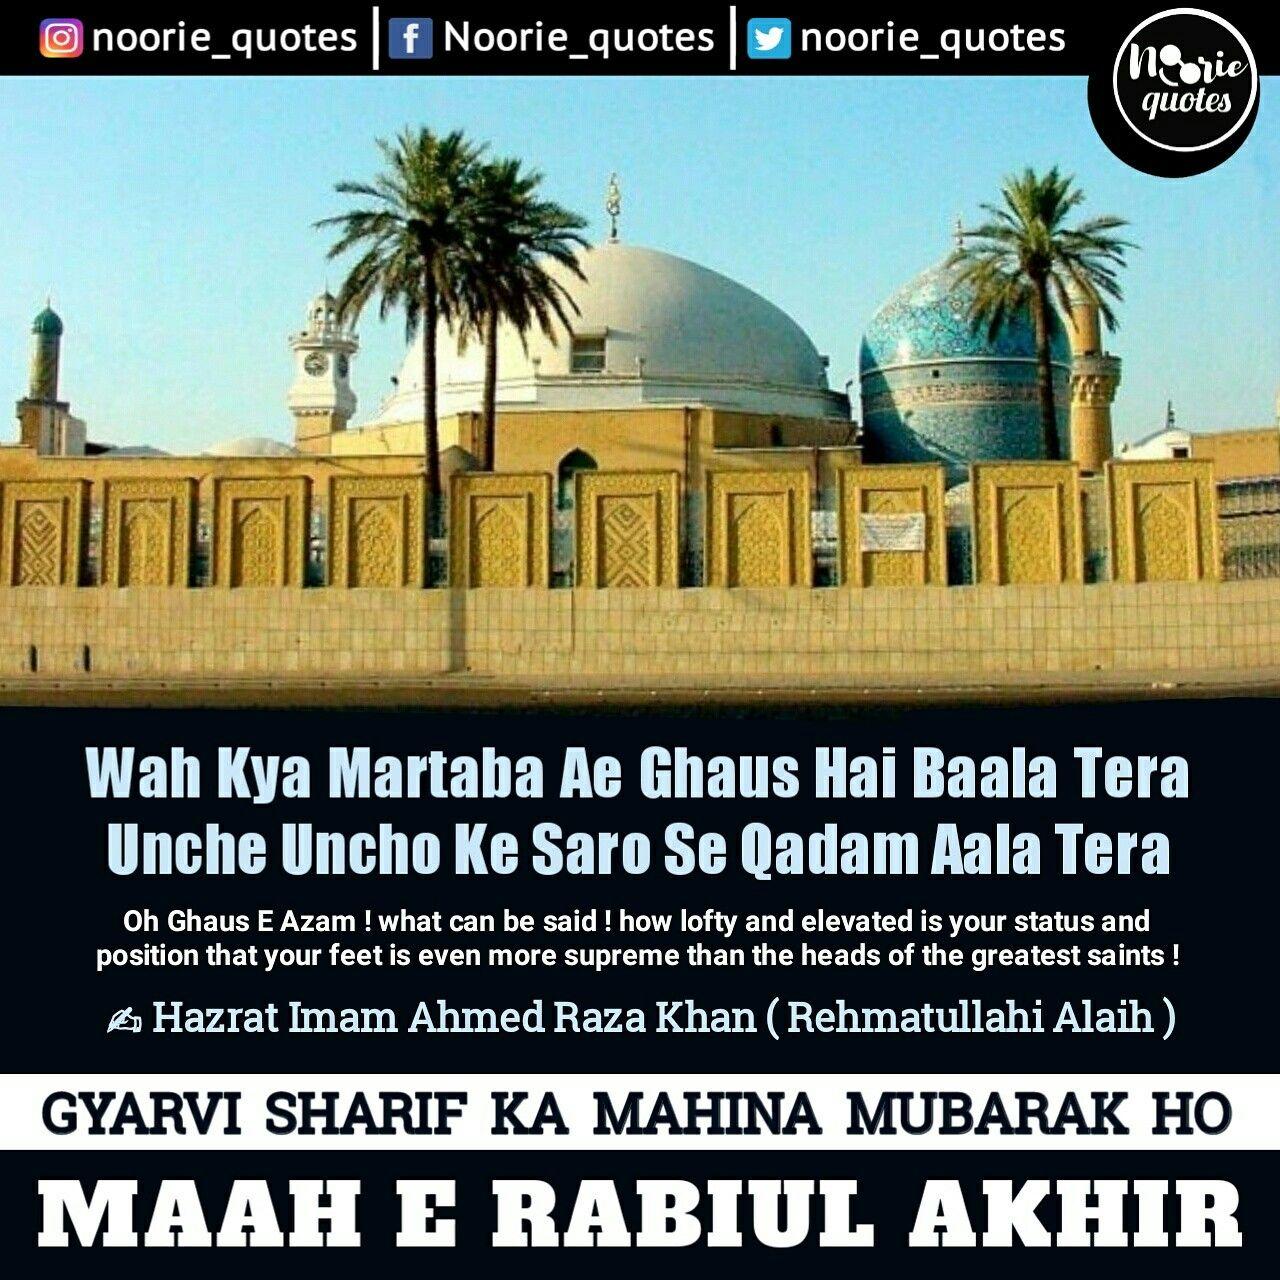 Manqabat e Ghaus-E-Aazam #noorie_quotes #ghausepaak #imaamahmedraza